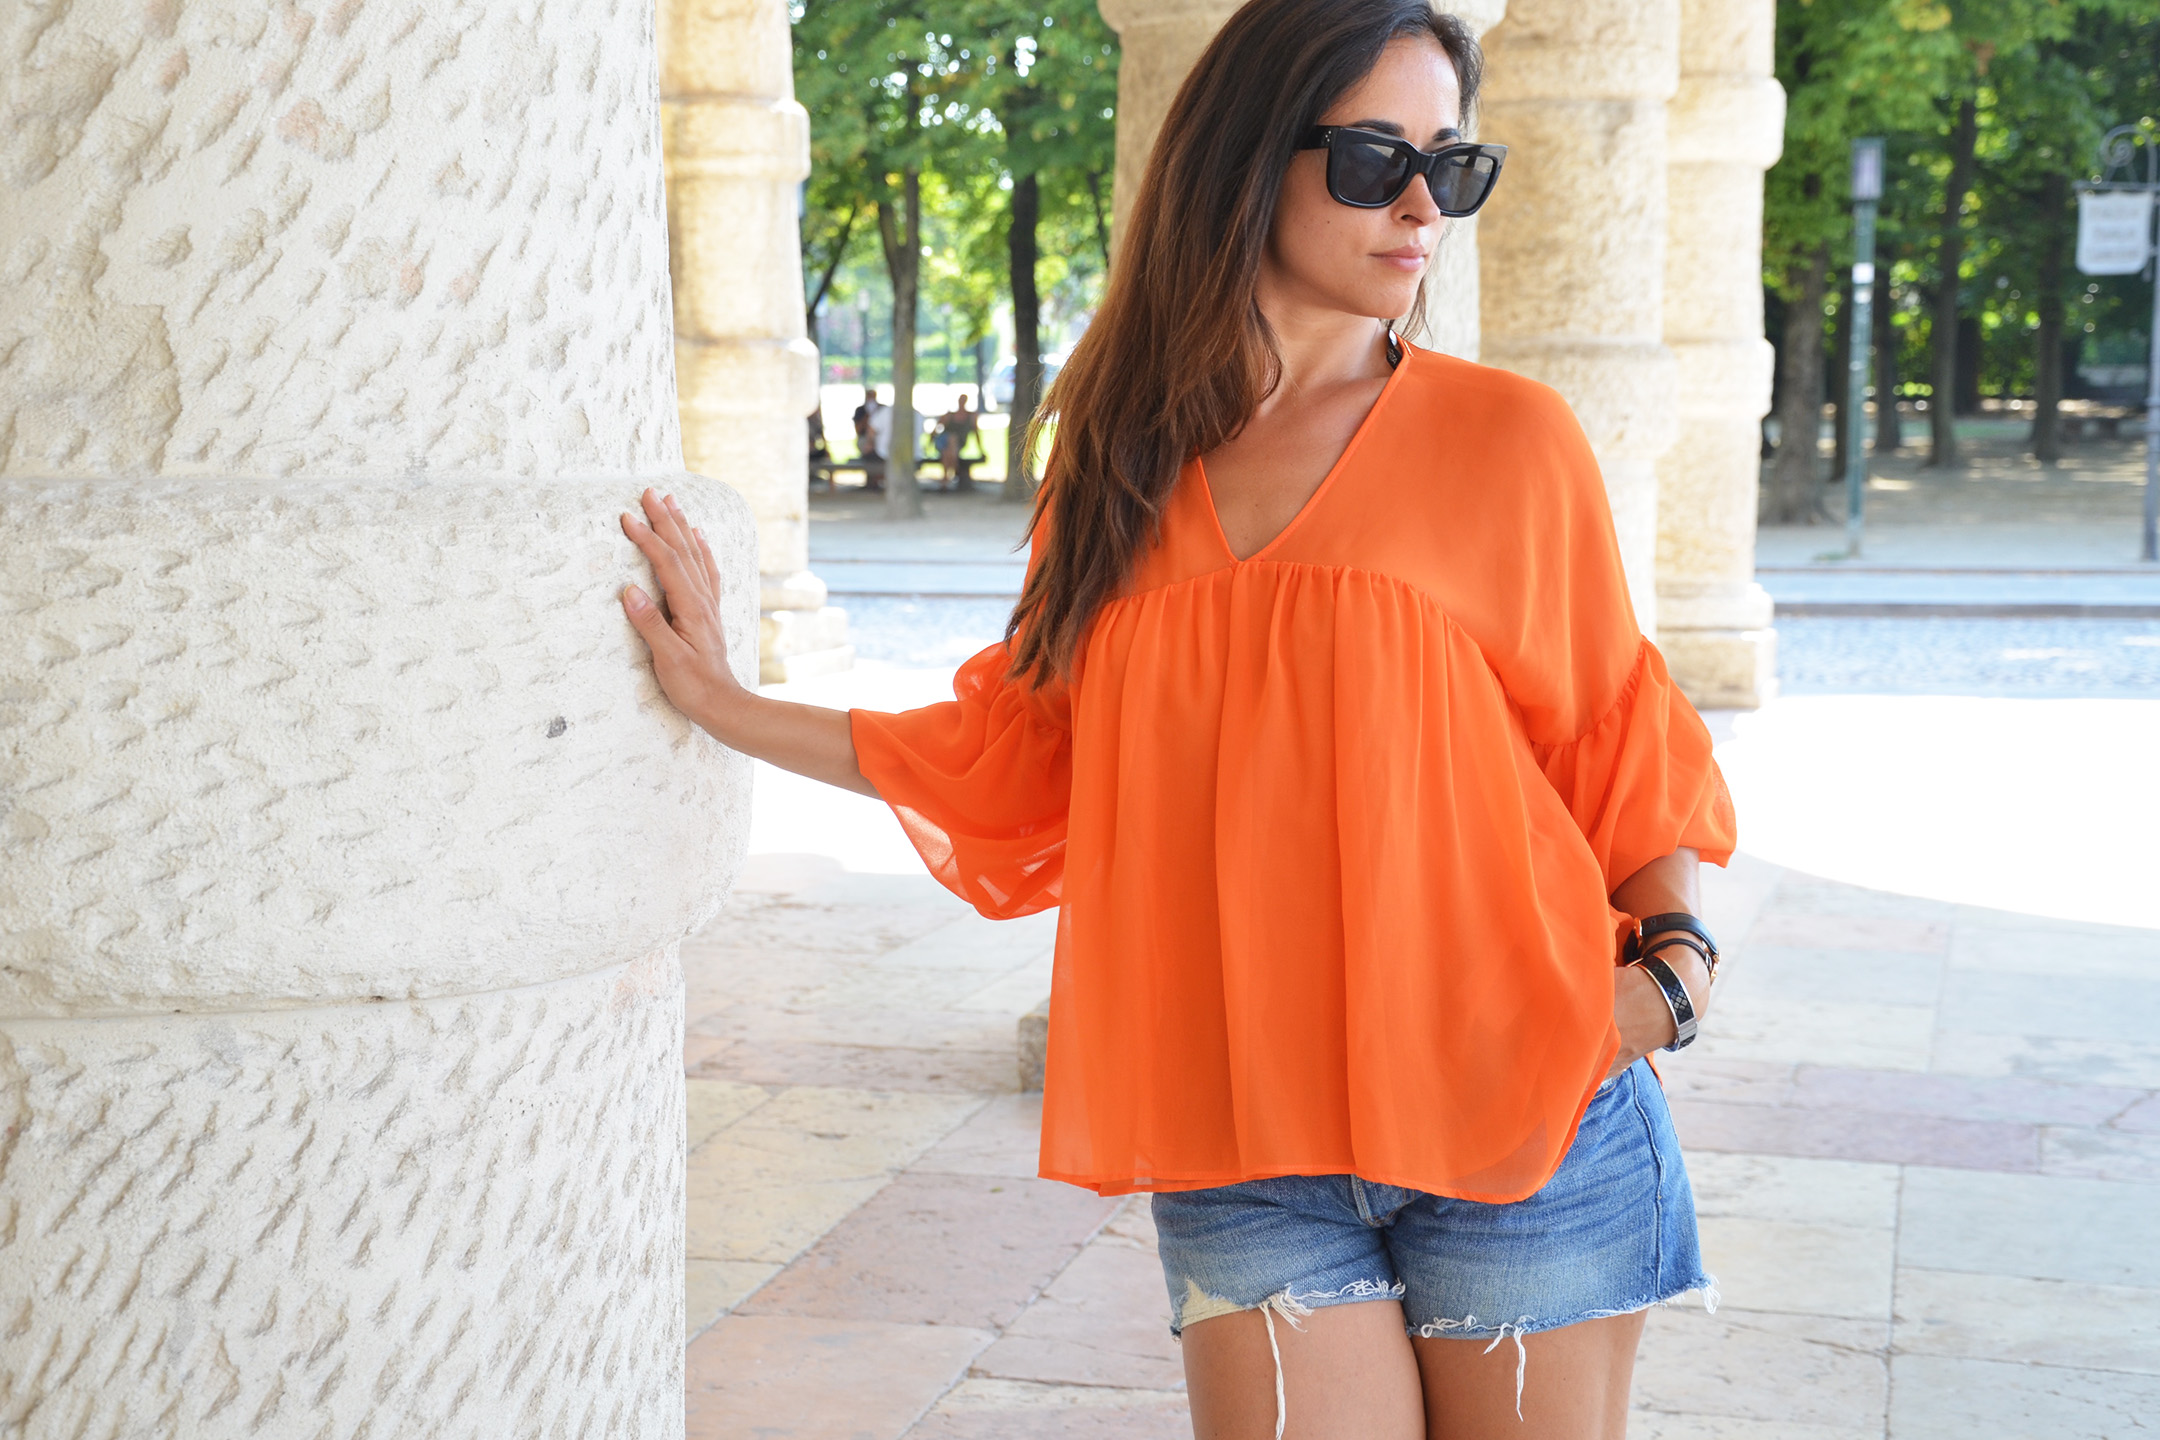 look-alessia-canella-shorts-blusa-arancio-organge